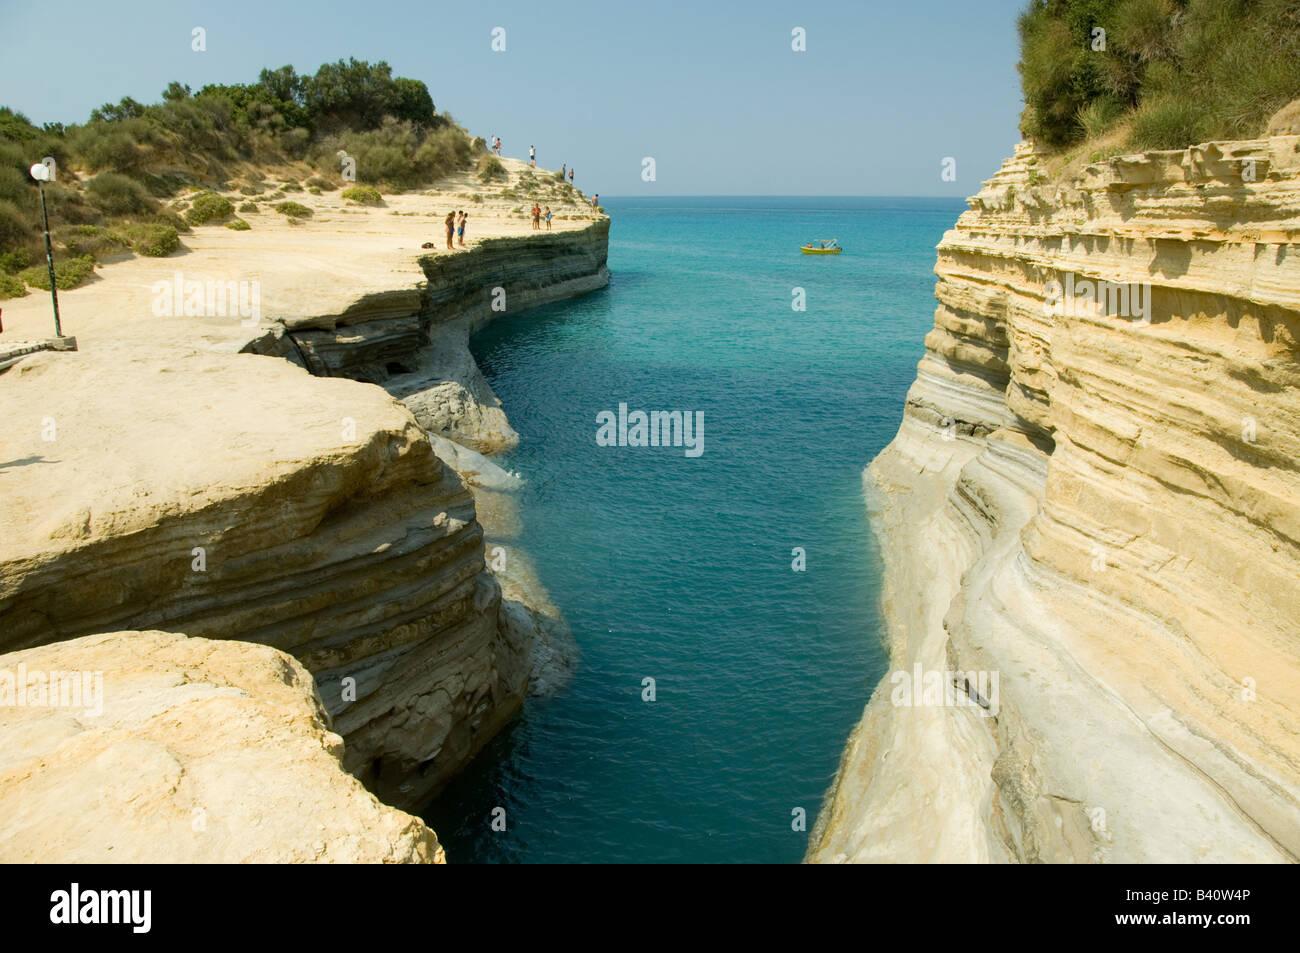 Sidari canal damour